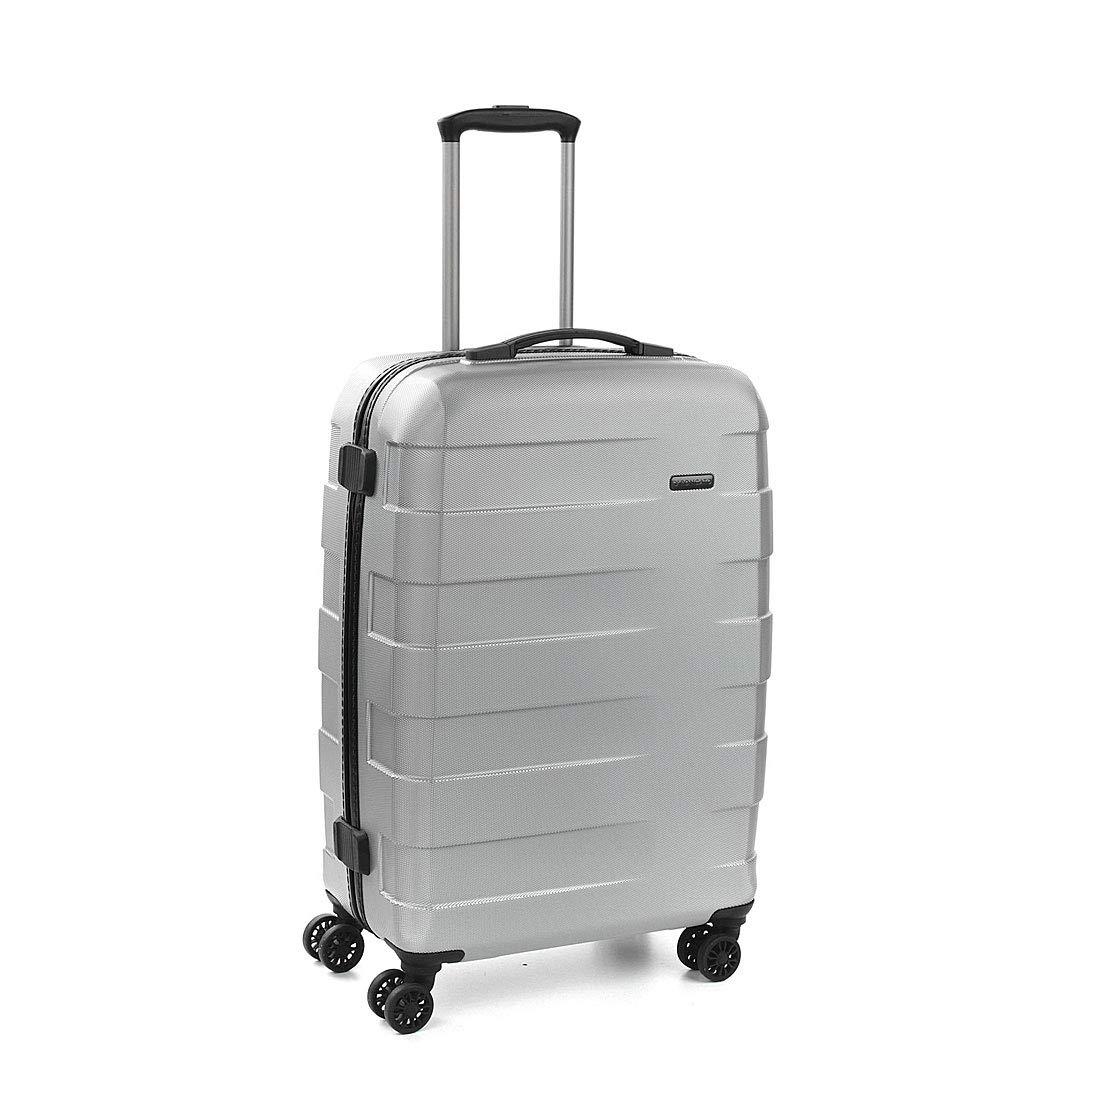 [RONCATO(ロンカート)] スーツケース RV-18 68L 60cm 2.8kg 5802 B07JGRPR3H シルバー